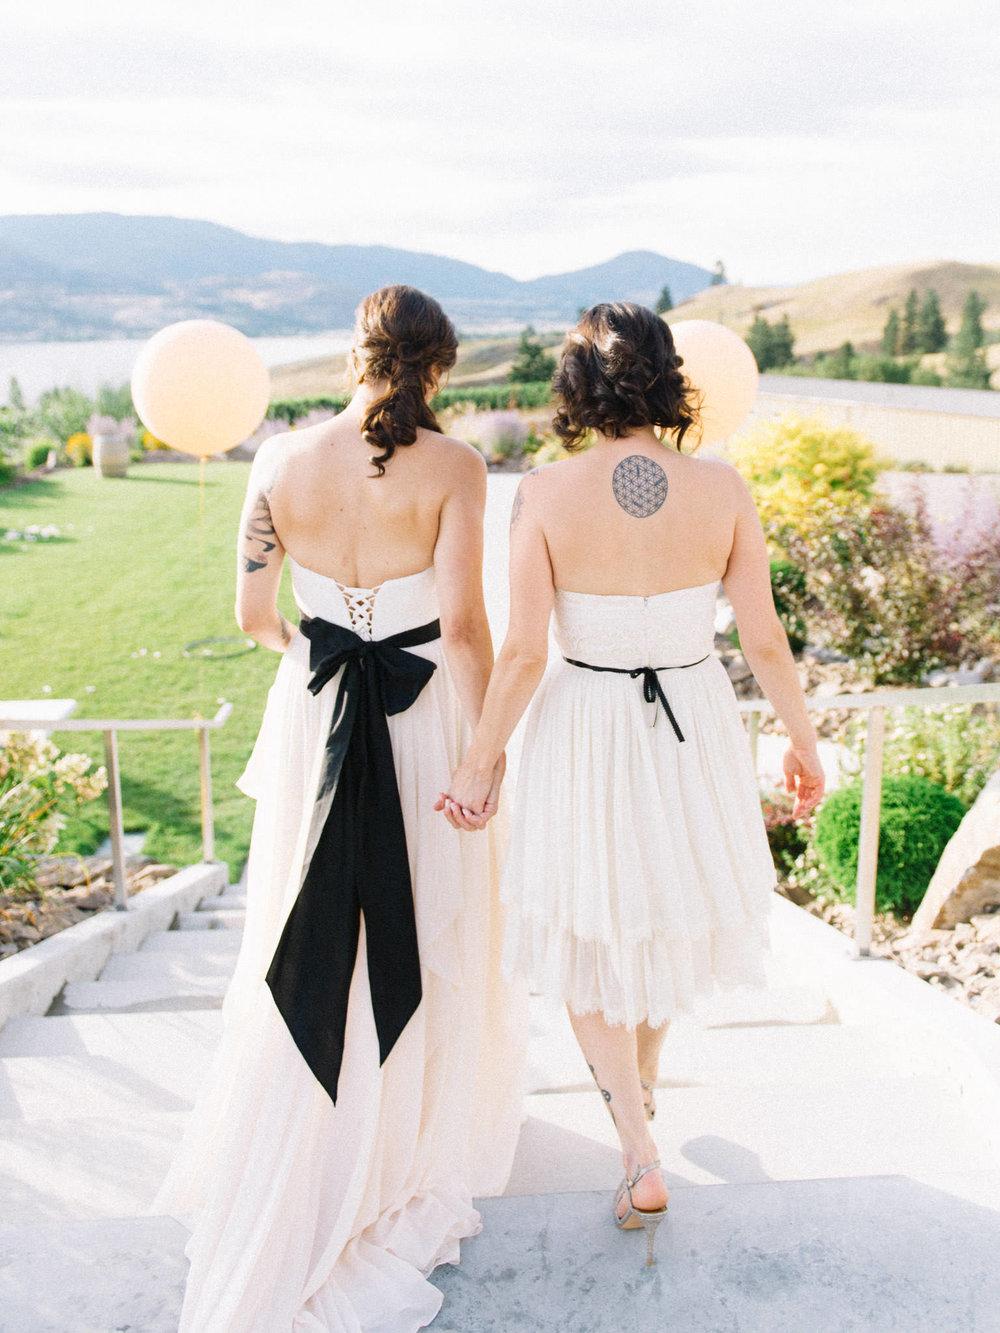 Vancouver LGBT wedding photographer